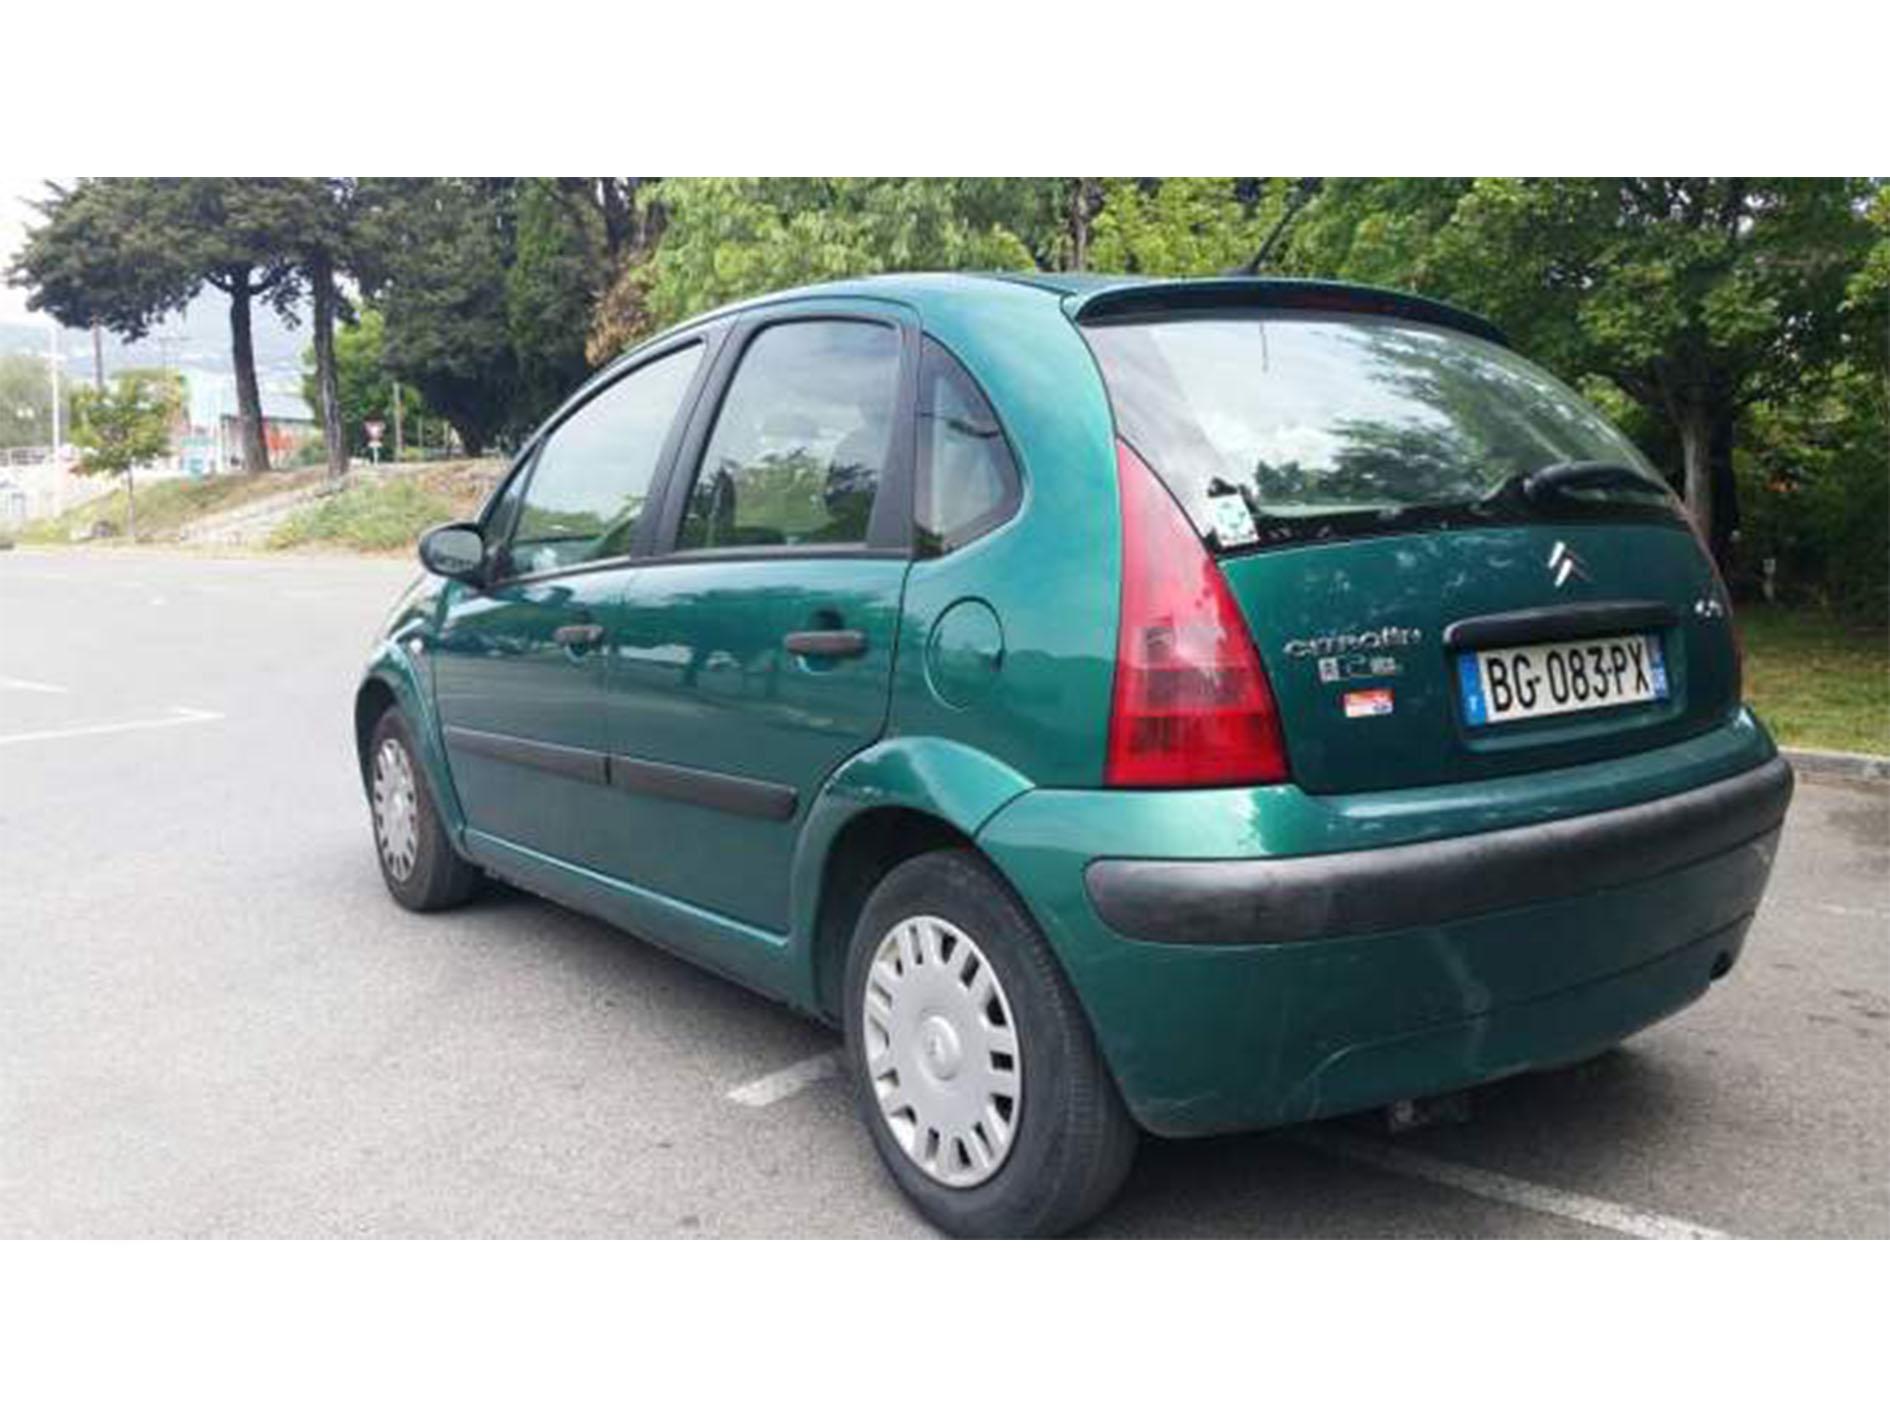 Vente voiture Citroën C3 hdi